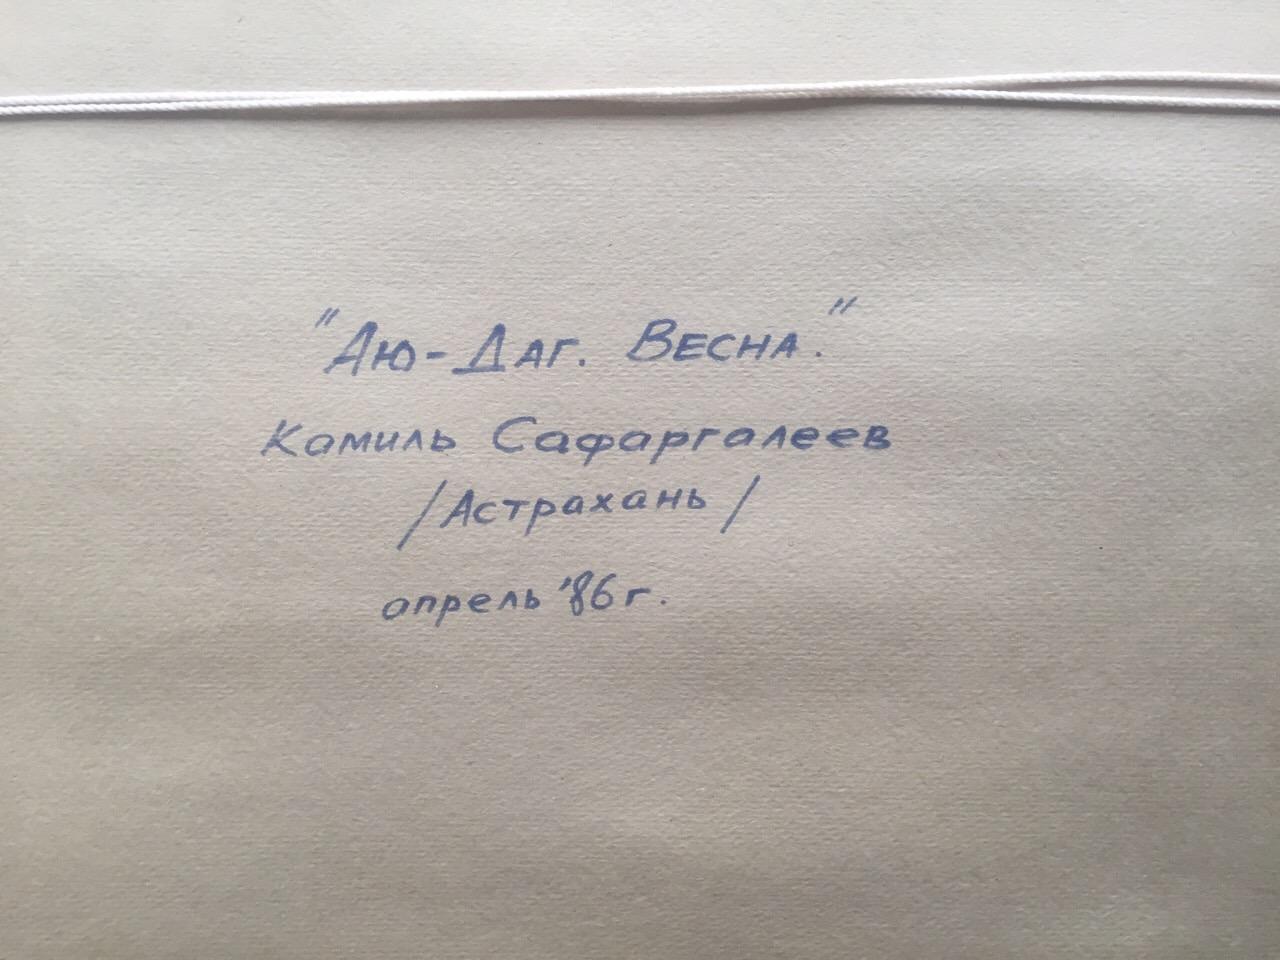 Аю-Даг. Весна 47-32 см., бумага, гуашь 1986 год - 2